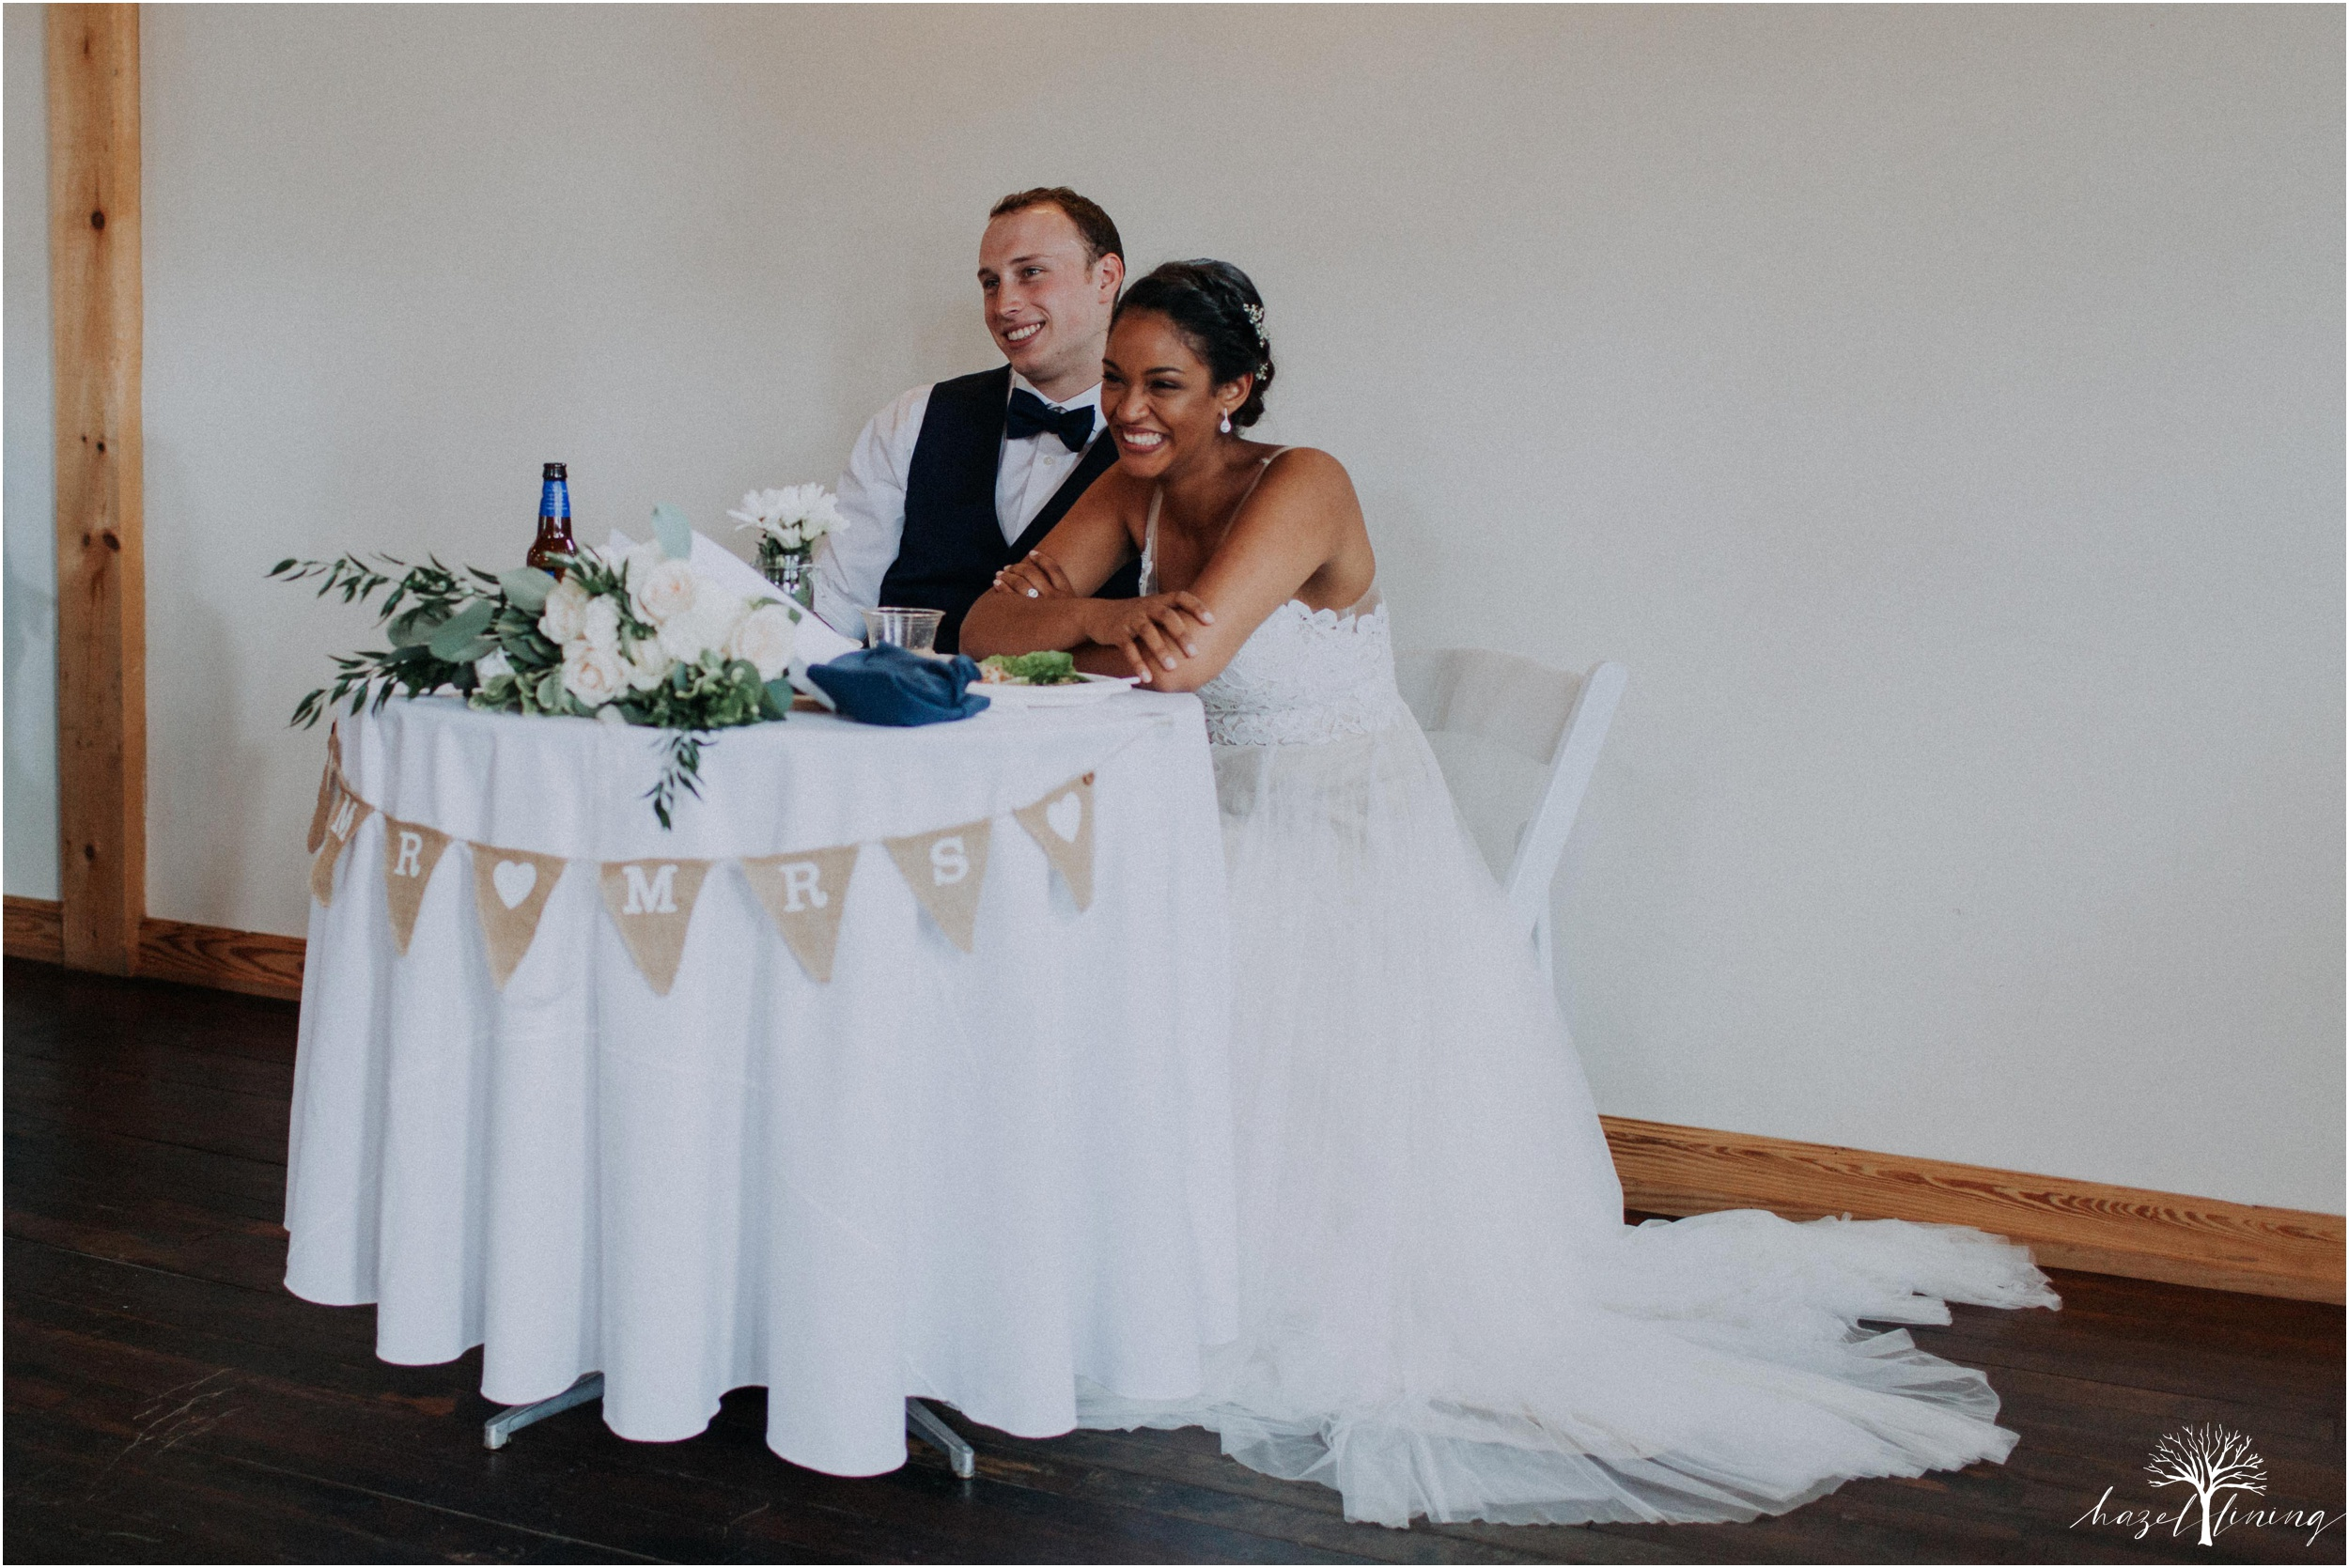 mariah-kreyling-samuel-sherratt-sherrattwiththeworld-peirce-farm-at-witch-hill-boston-massachusetts-wedding-photography-hazel-lining-travel-wedding-elopement-photography_0169.jpg